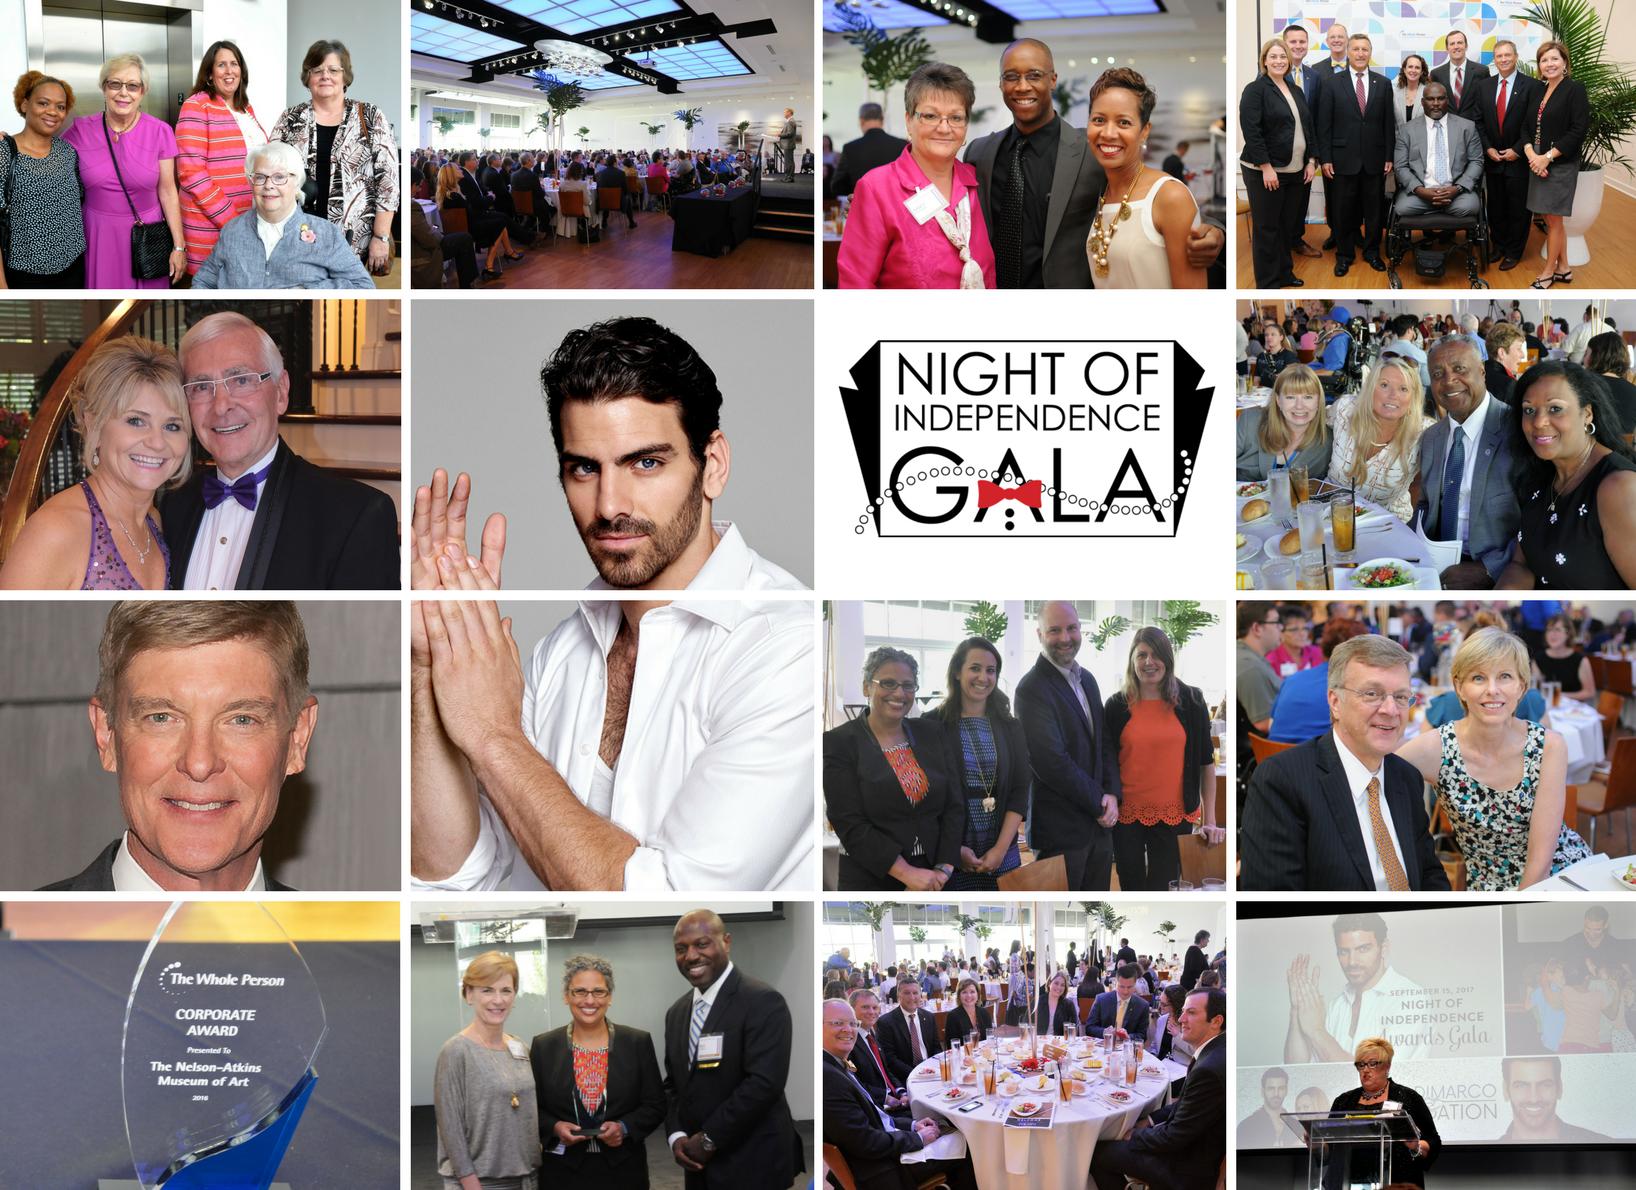 Night of Independence Gala, September 15